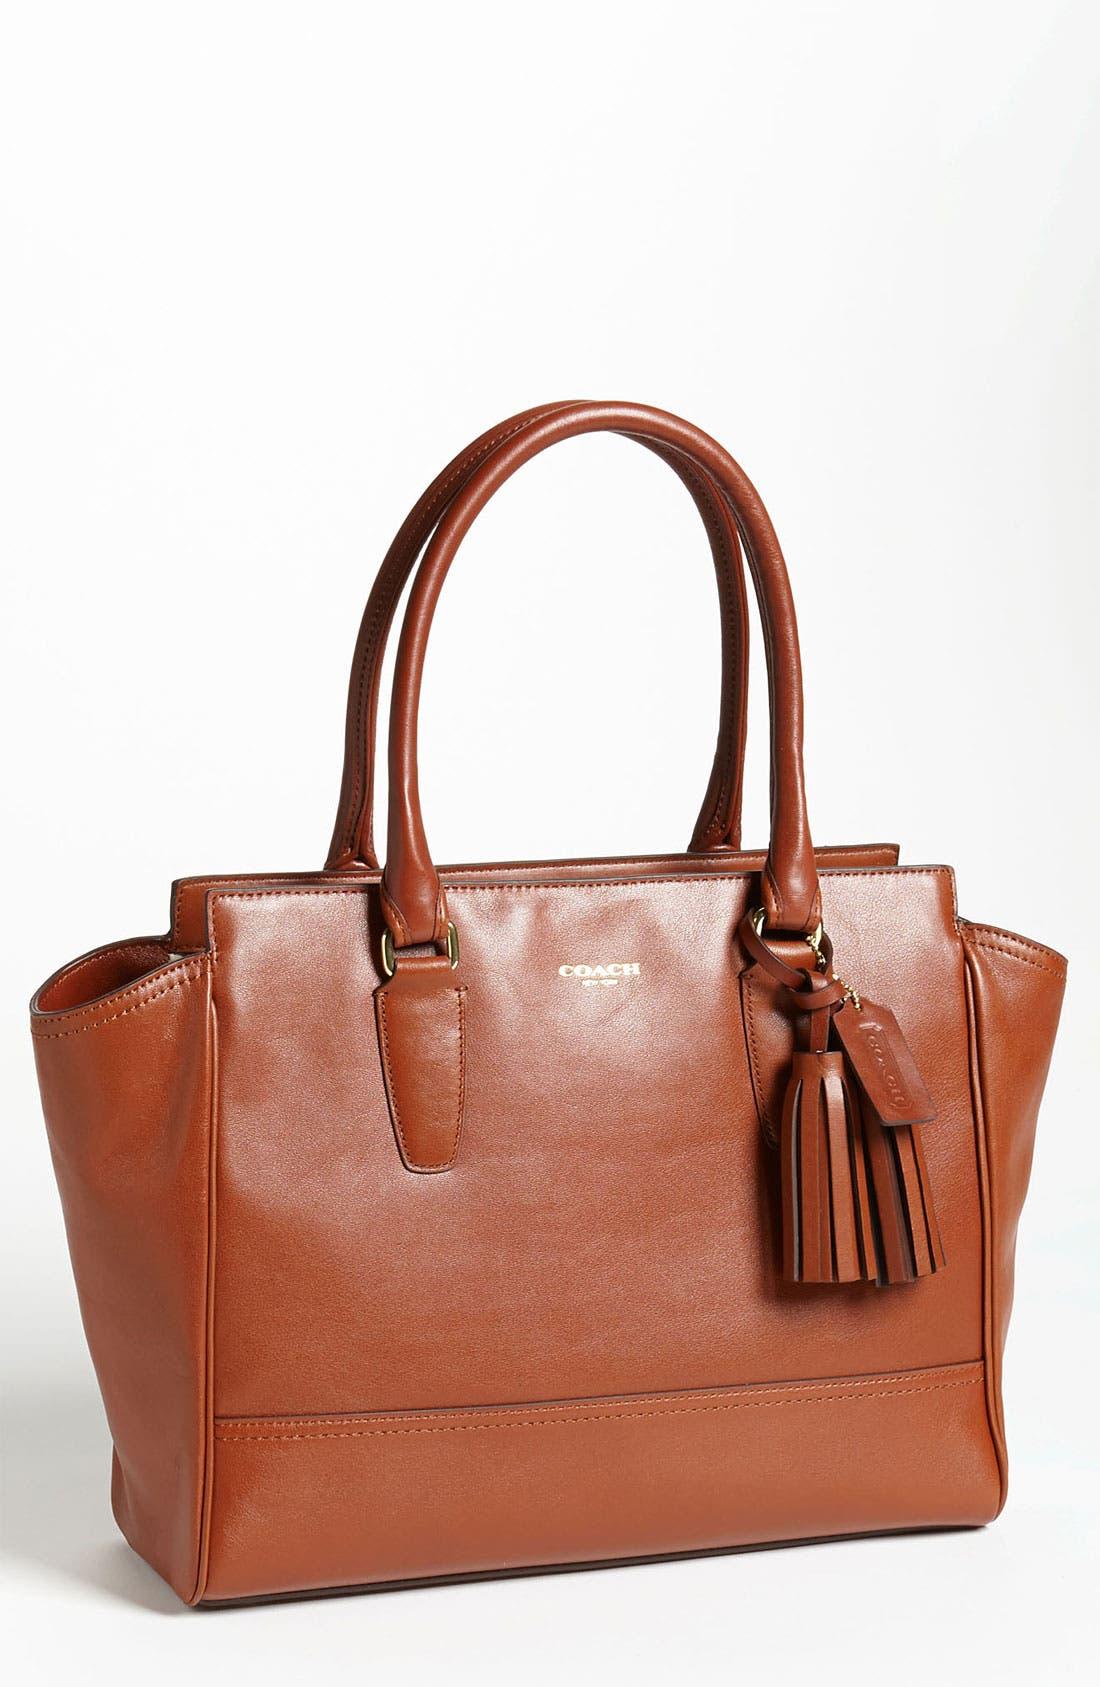 Alternate Image 1 Selected - COACH 'Legacy Candace - Medium' Shoulder Bag